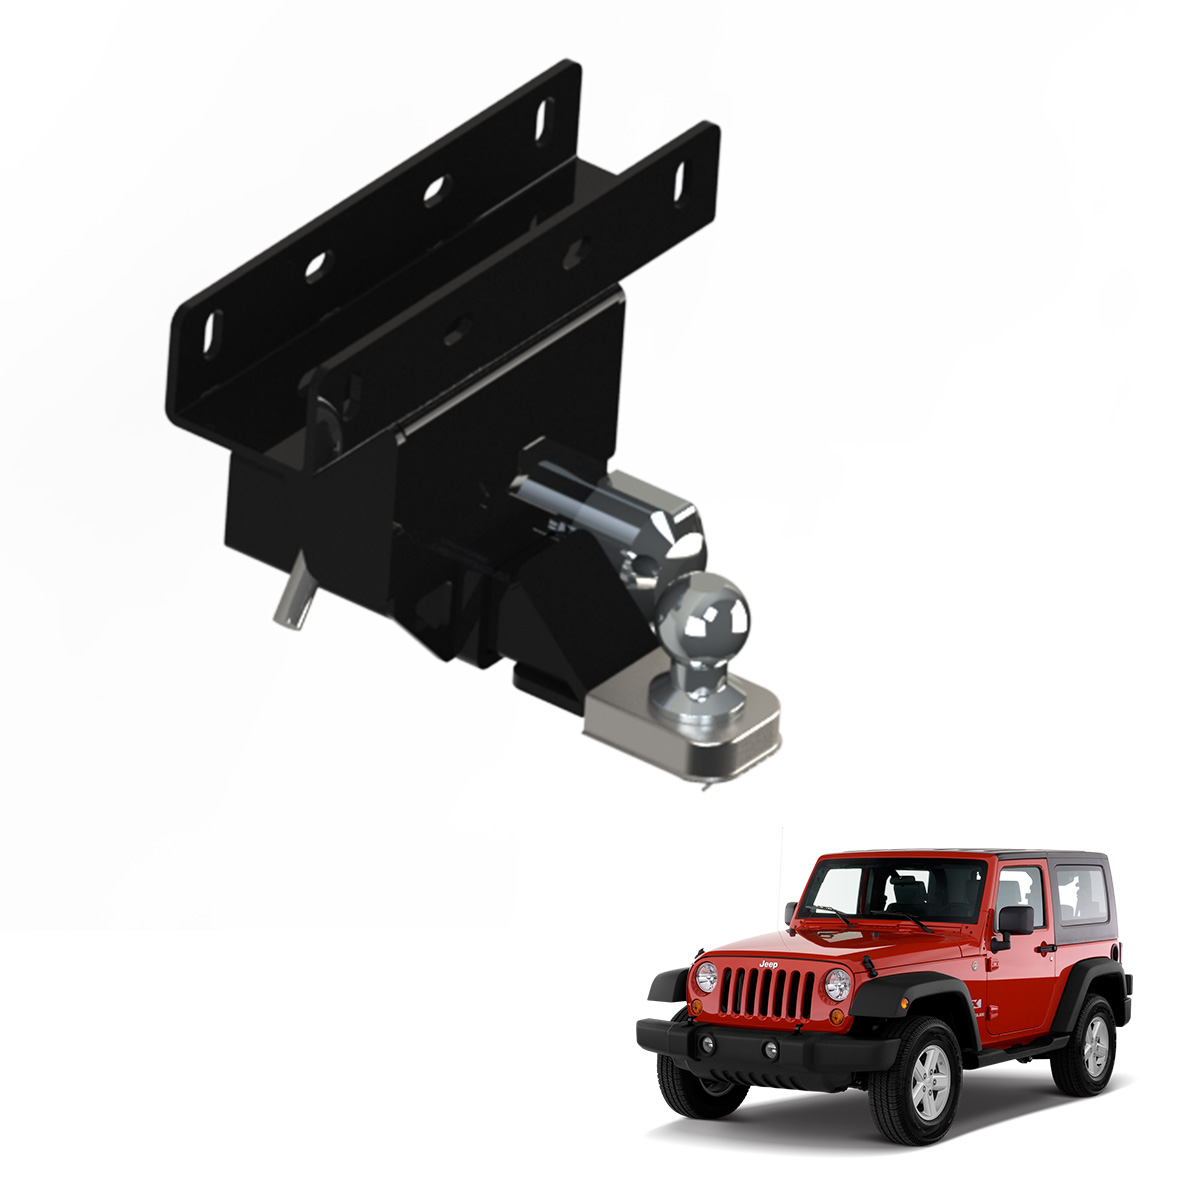 Engate de reboque Jeep Wrangler 2007 a 2016 remov�vel 1500 Kg